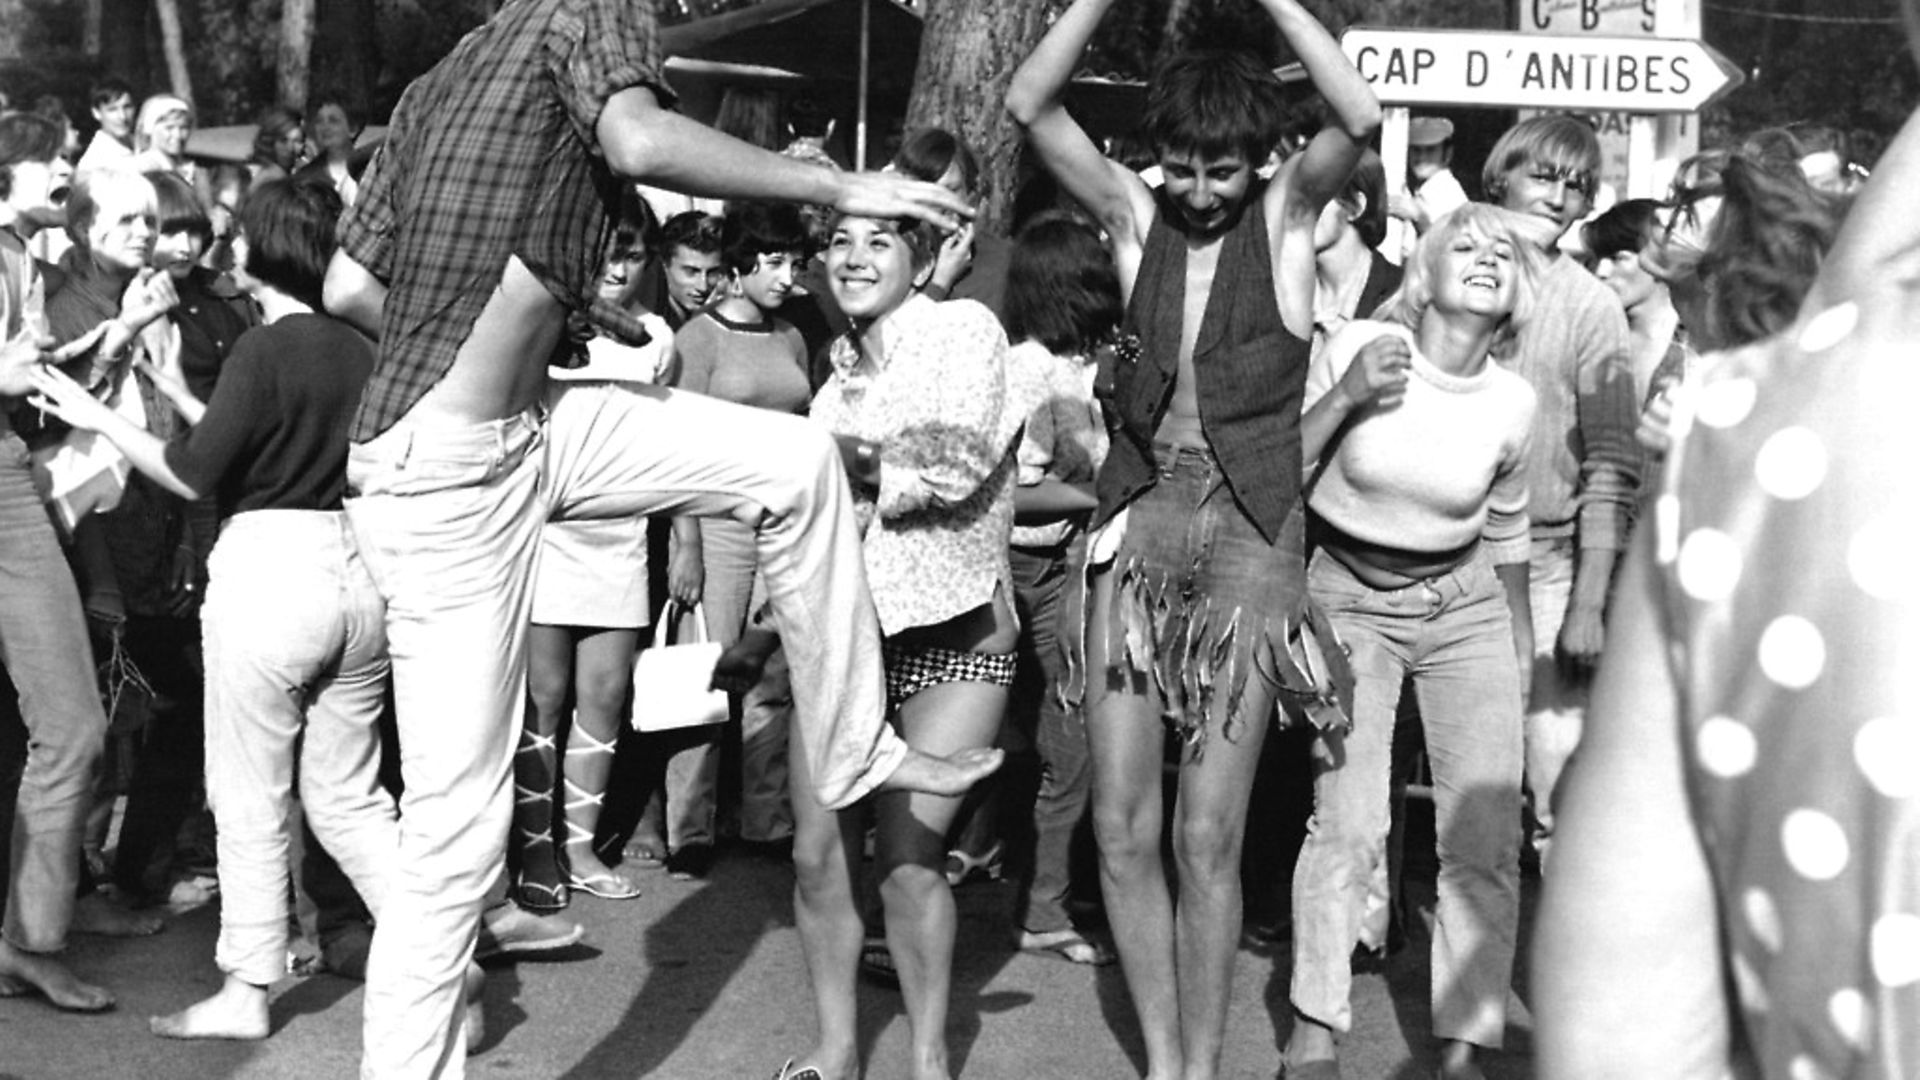 La jeunesse dansant le jerk dans les rues de Juan-les-Pins, France en 1966. Photo: Keystone-France/Gamma-Rapho via Getty Images) - Credit: Gamma-Keystone via Getty Images